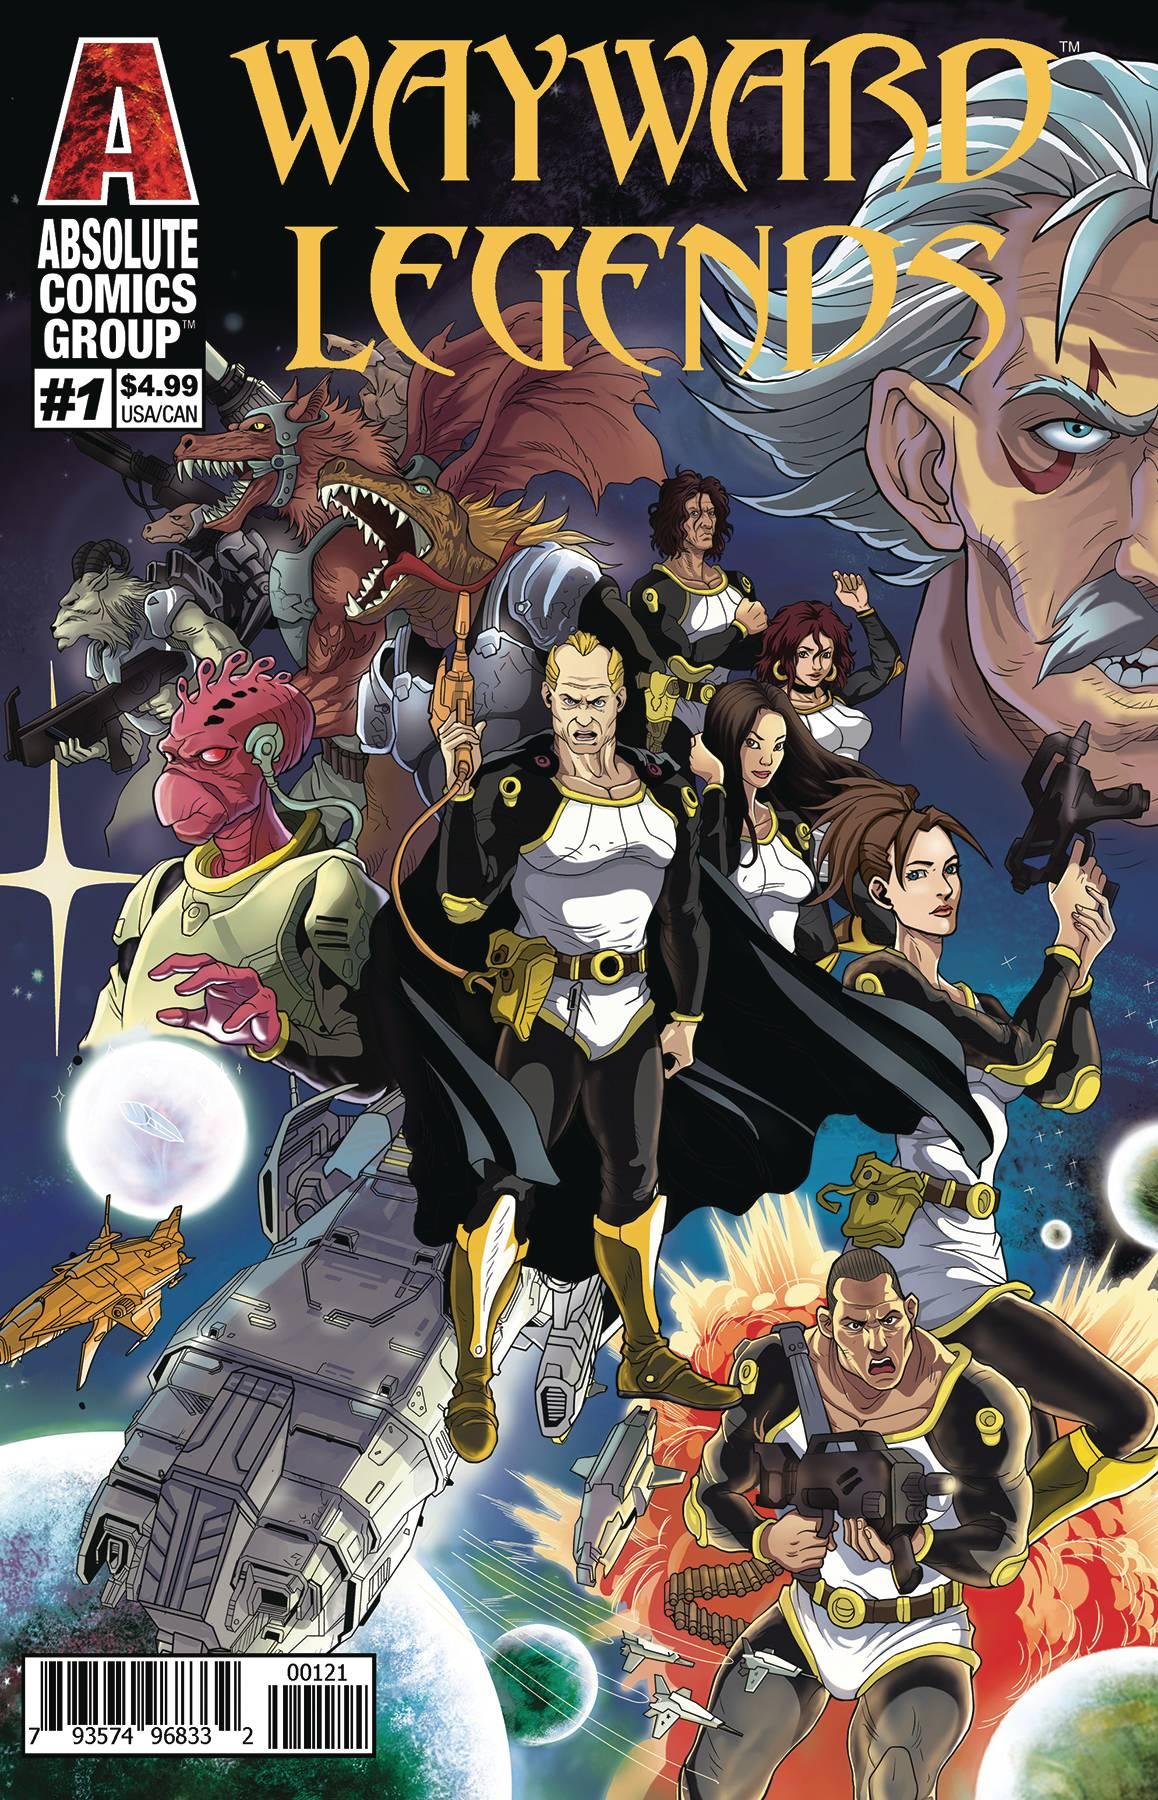 Wayward Legends #1 (2020)